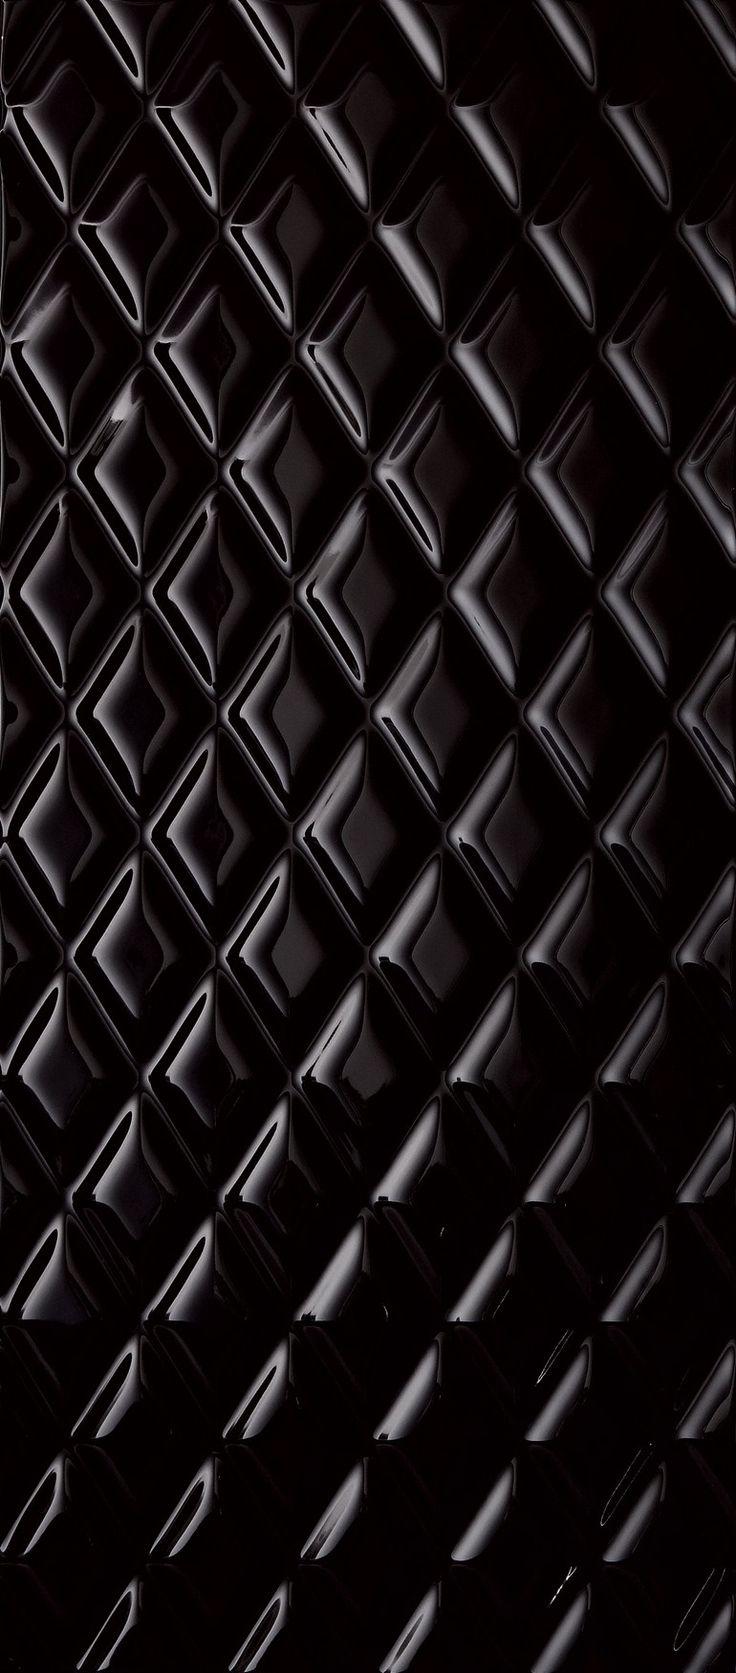 Indoor ceramic wall #tiles BIANCONERO by Impronta Ceramiche #black